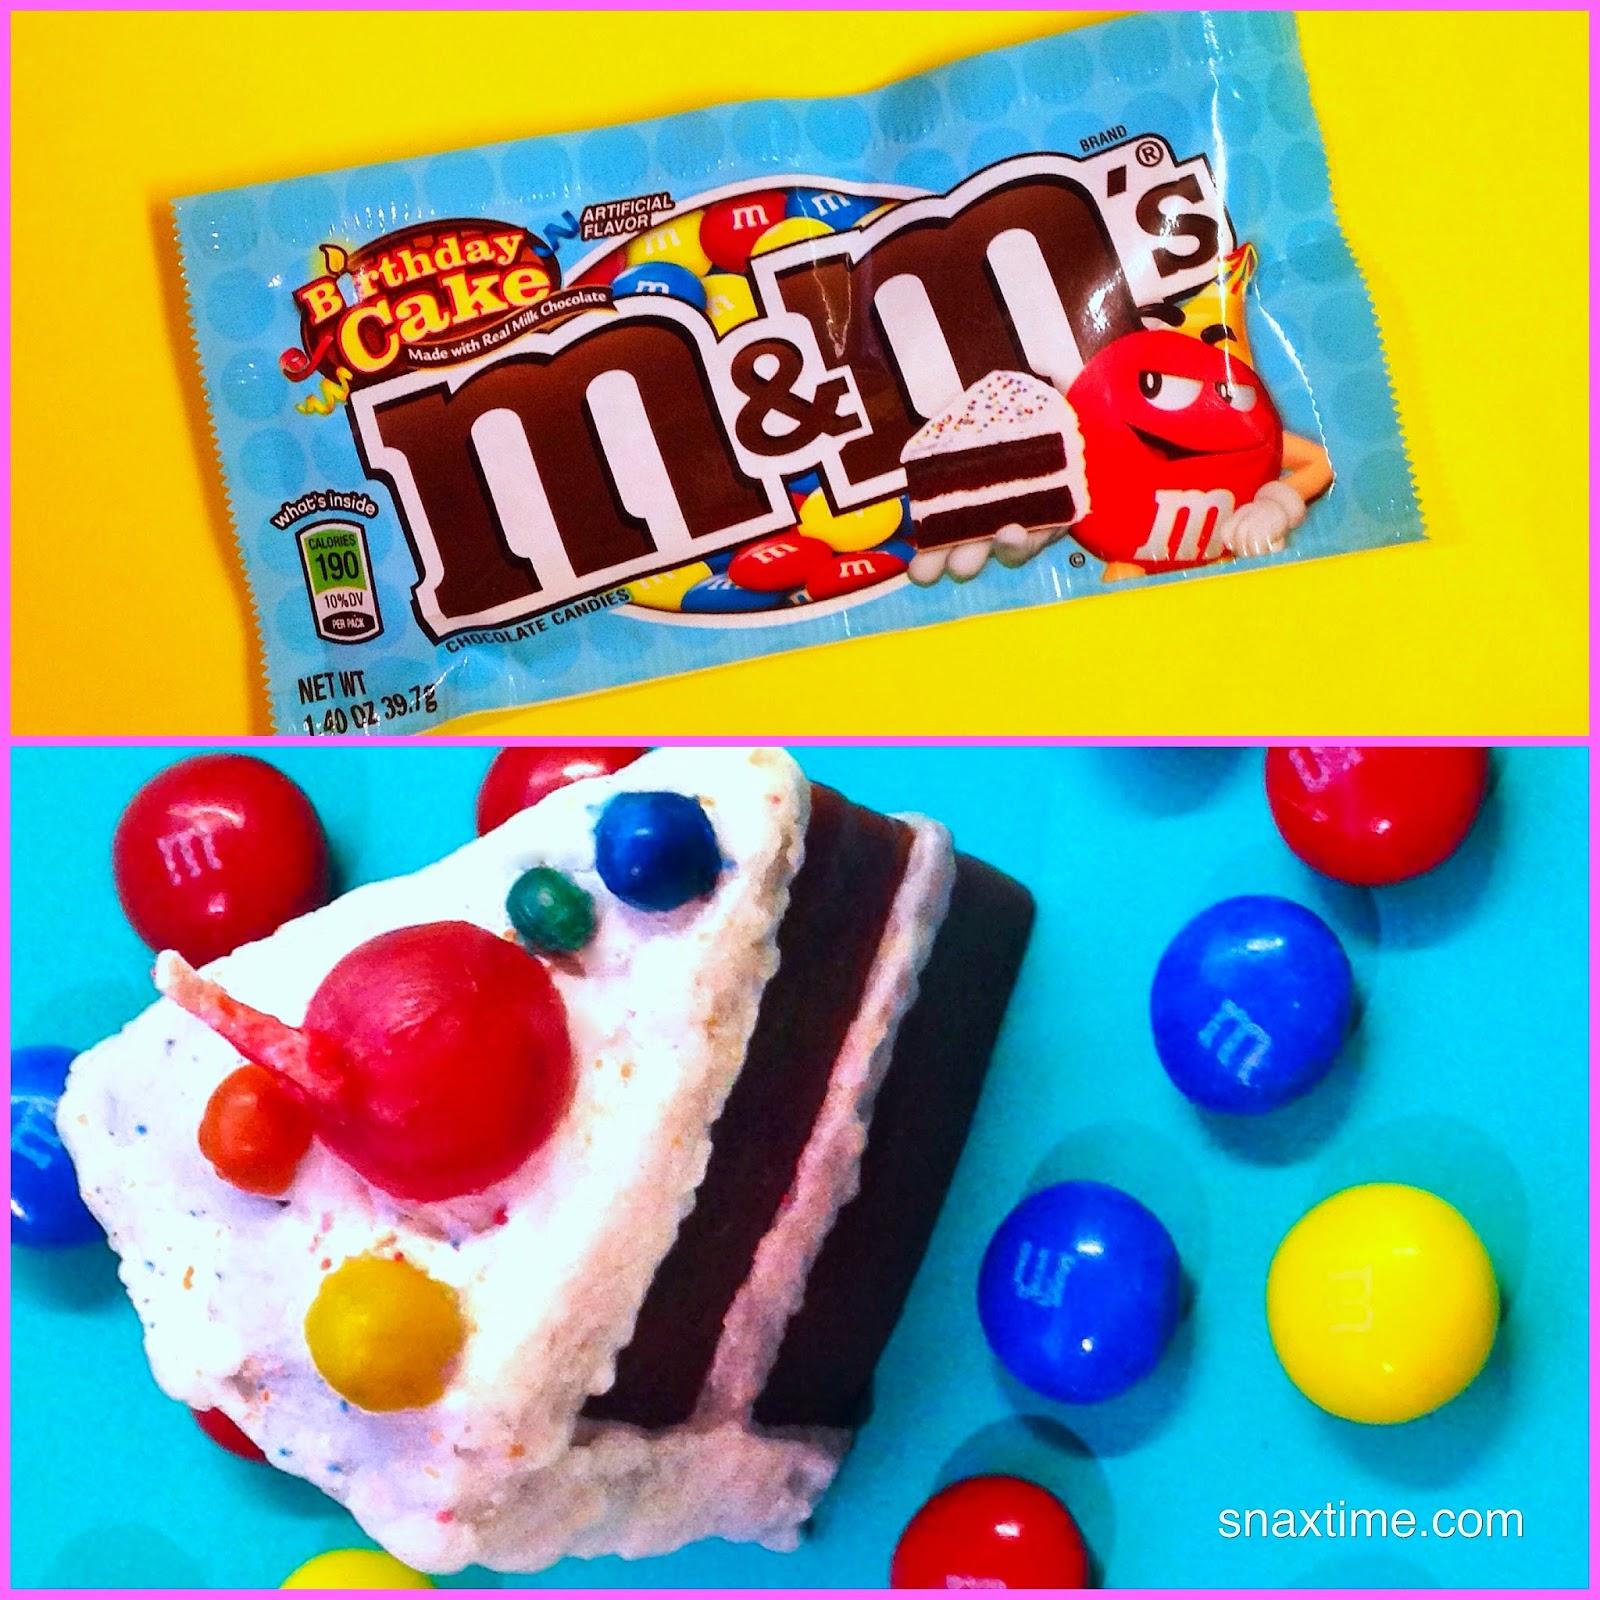 Birthday Cake MMs Birthday Wishes Come True Snaxtime